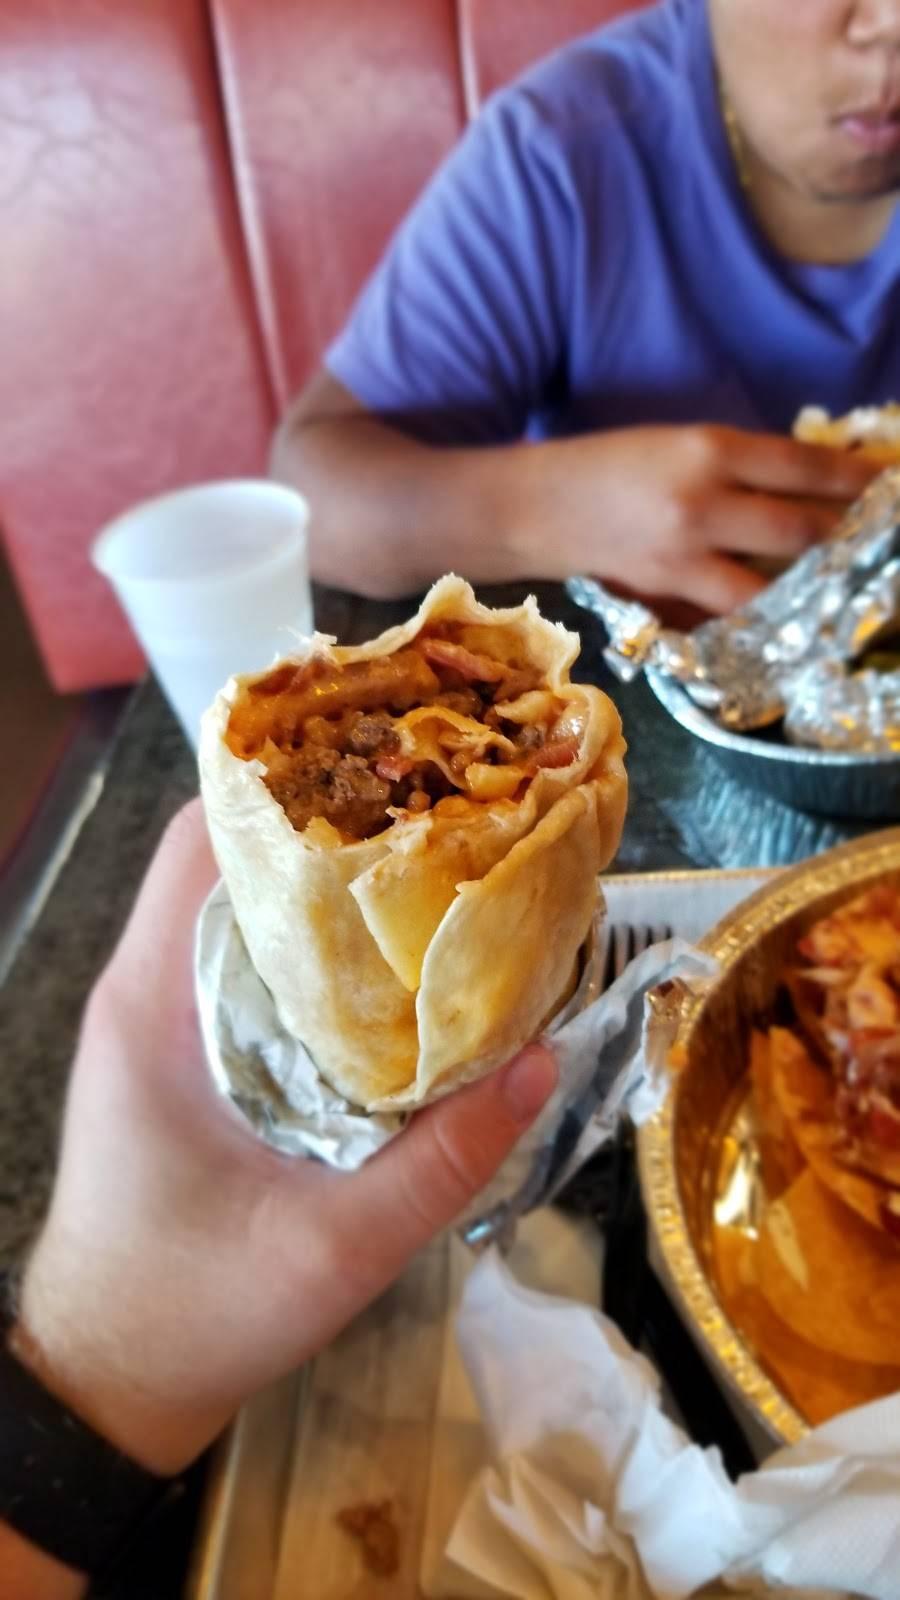 Sweeto Burrito | restaurant | 14313 Potomac Mills Rd, Woodbridge, VA 22192, USA | 5713986591 OR +1 571-398-6591